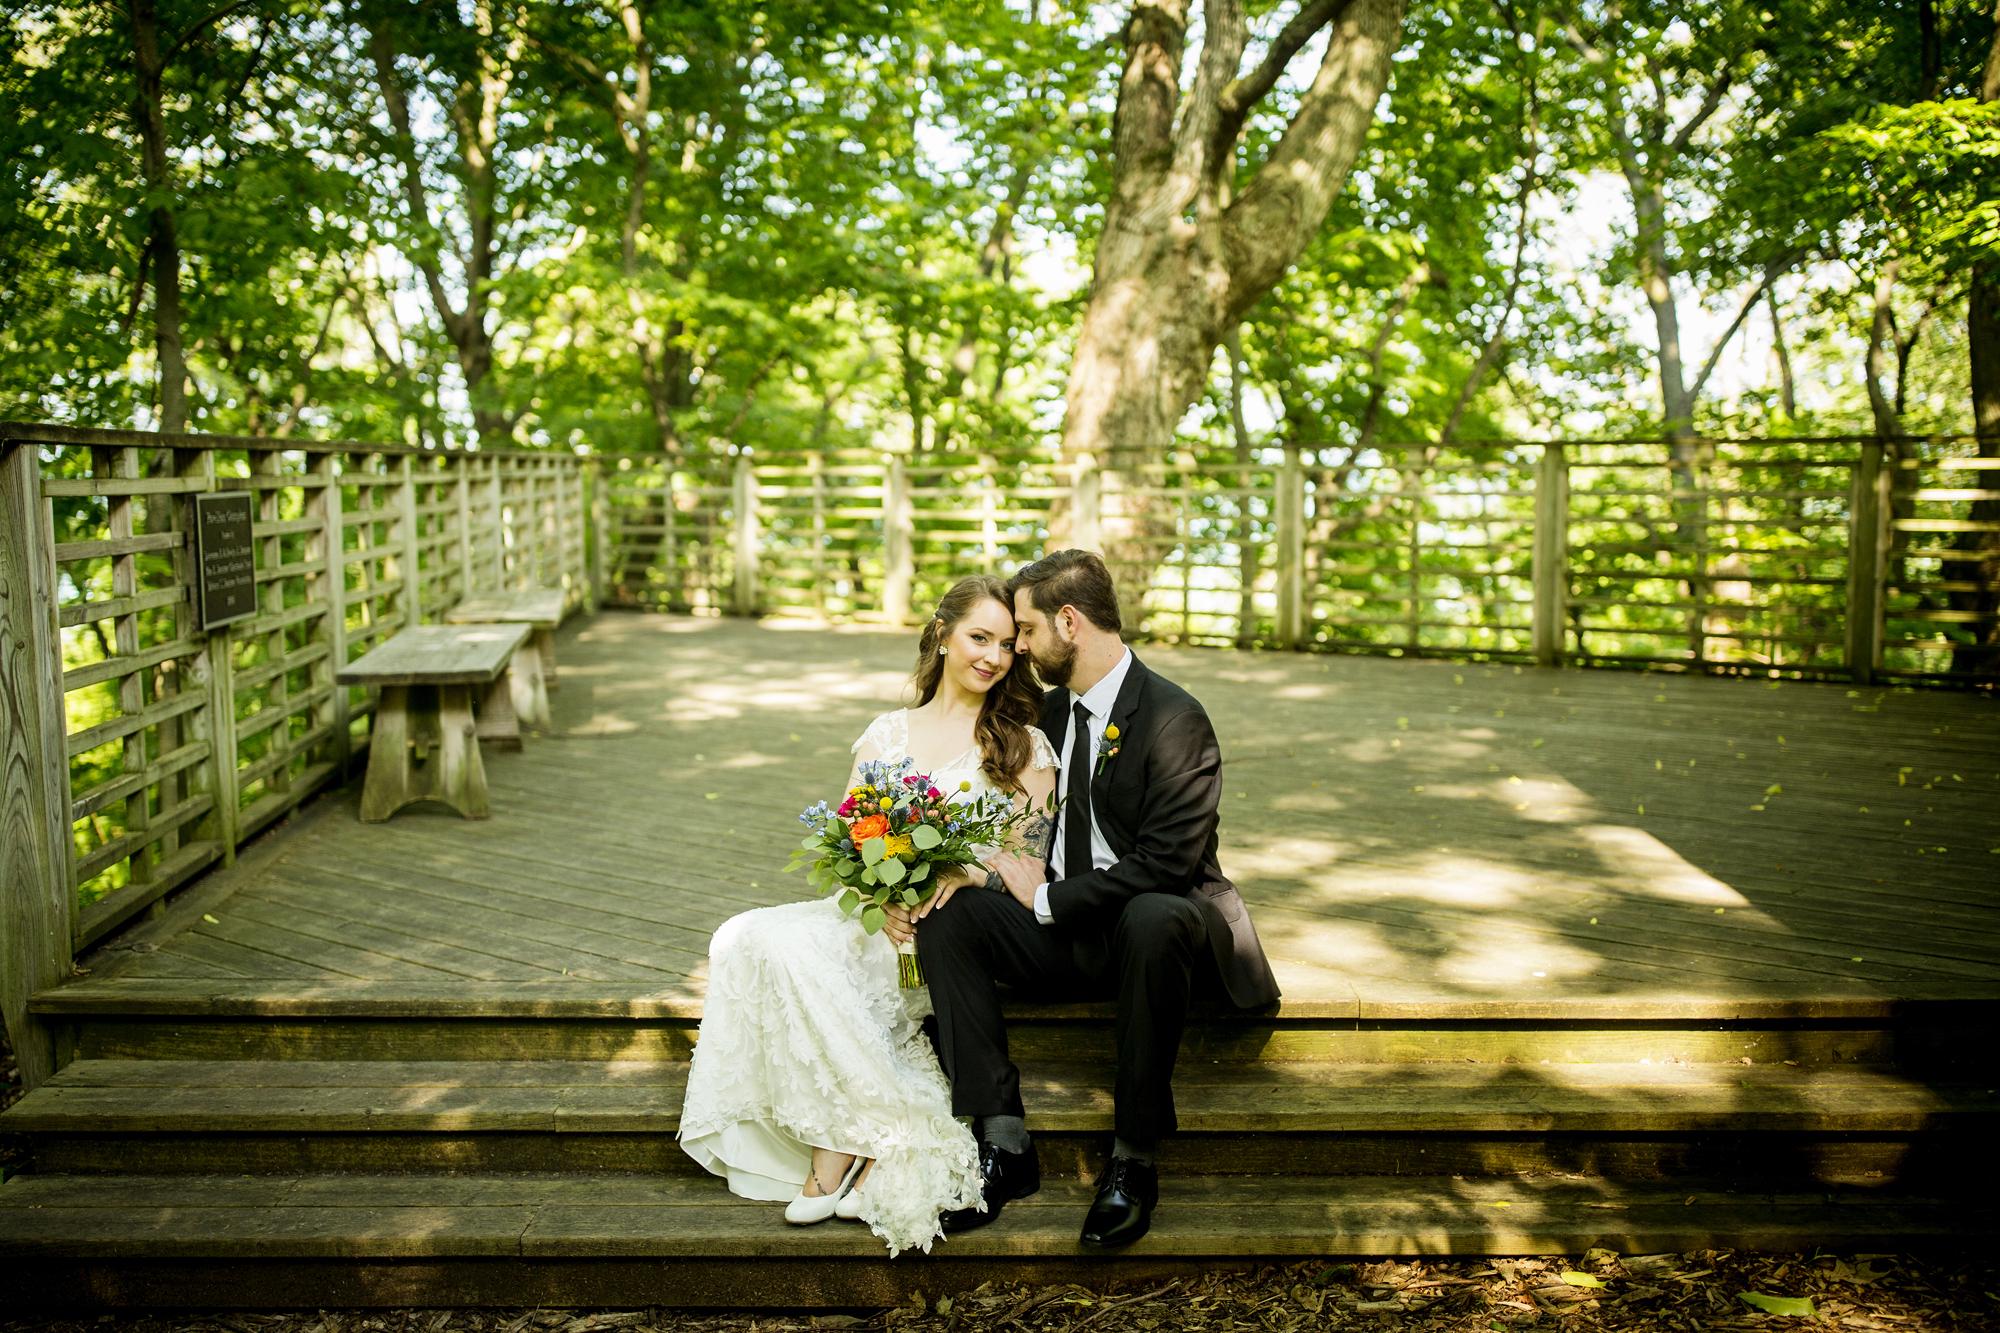 Seriously_Sabrina_Photography_Milwaukee_Wisconsin_Wedding_Schlitz_Audubon_Nature_Center_BrunderRife51.jpg